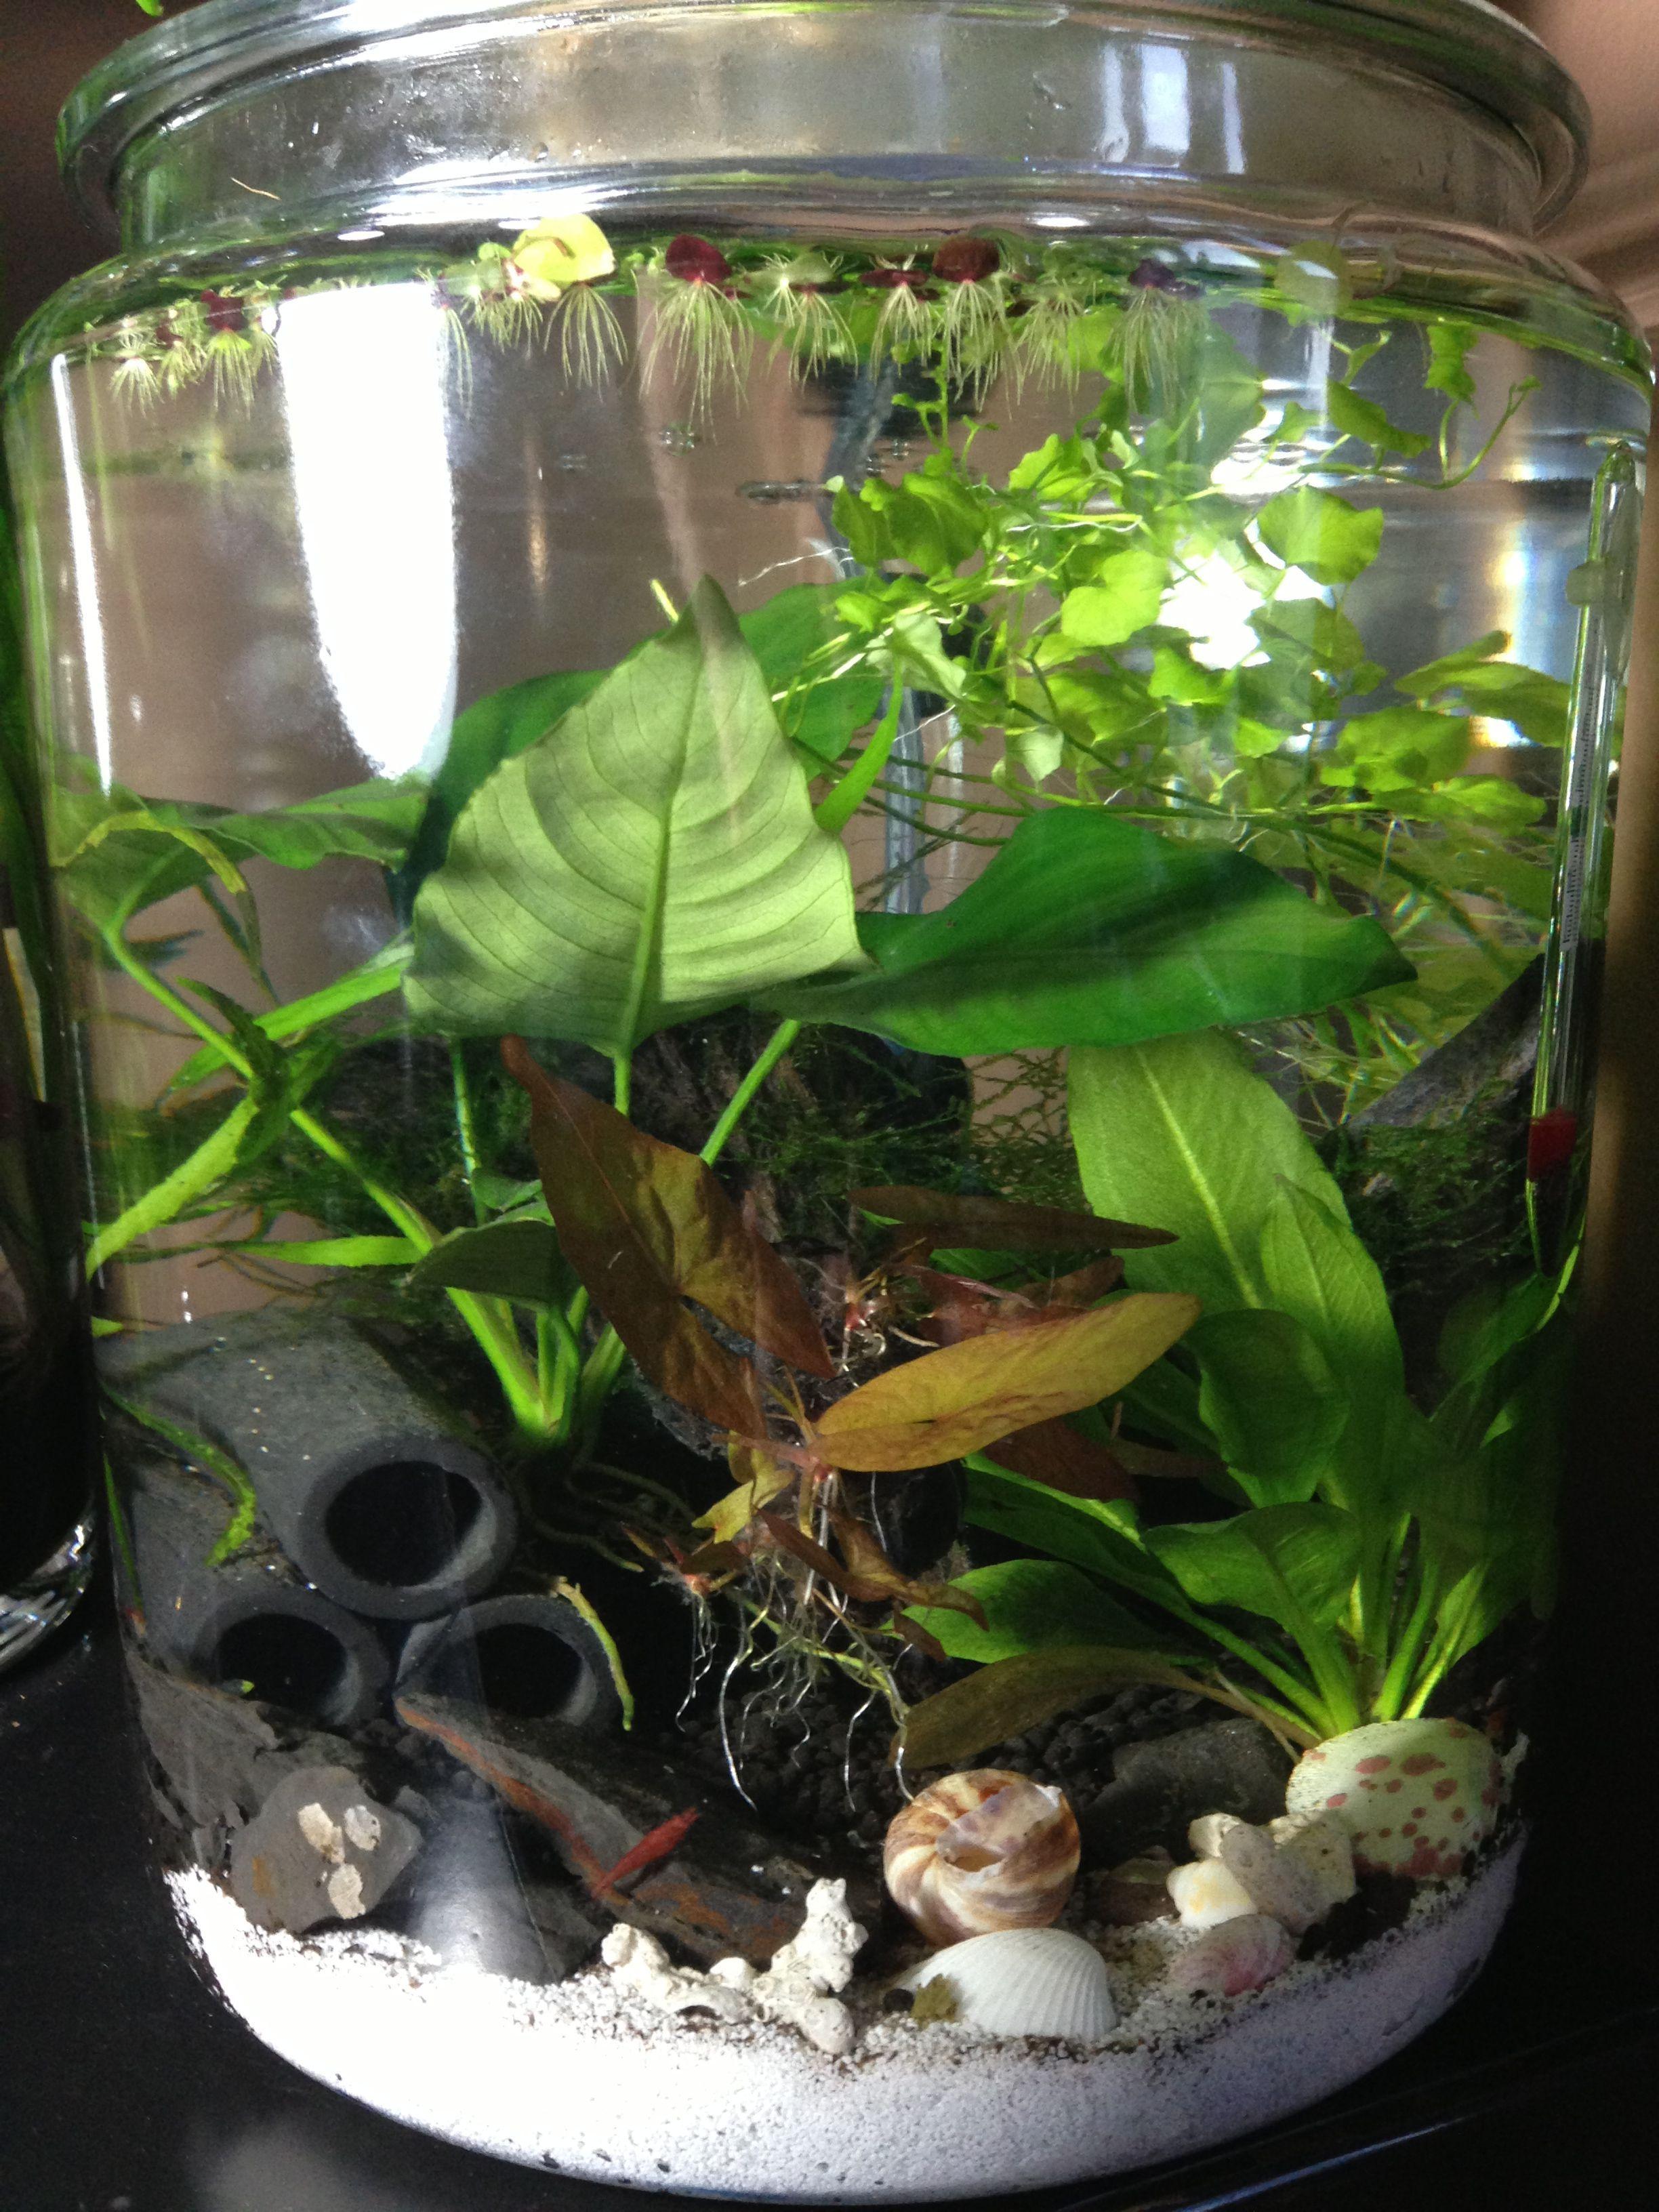 3 Gallon Planted Jar Aquarium With Red Cherry Shrimp Freshwater Aquarium Plants Planted Aquarium Red Cherry Shrimp